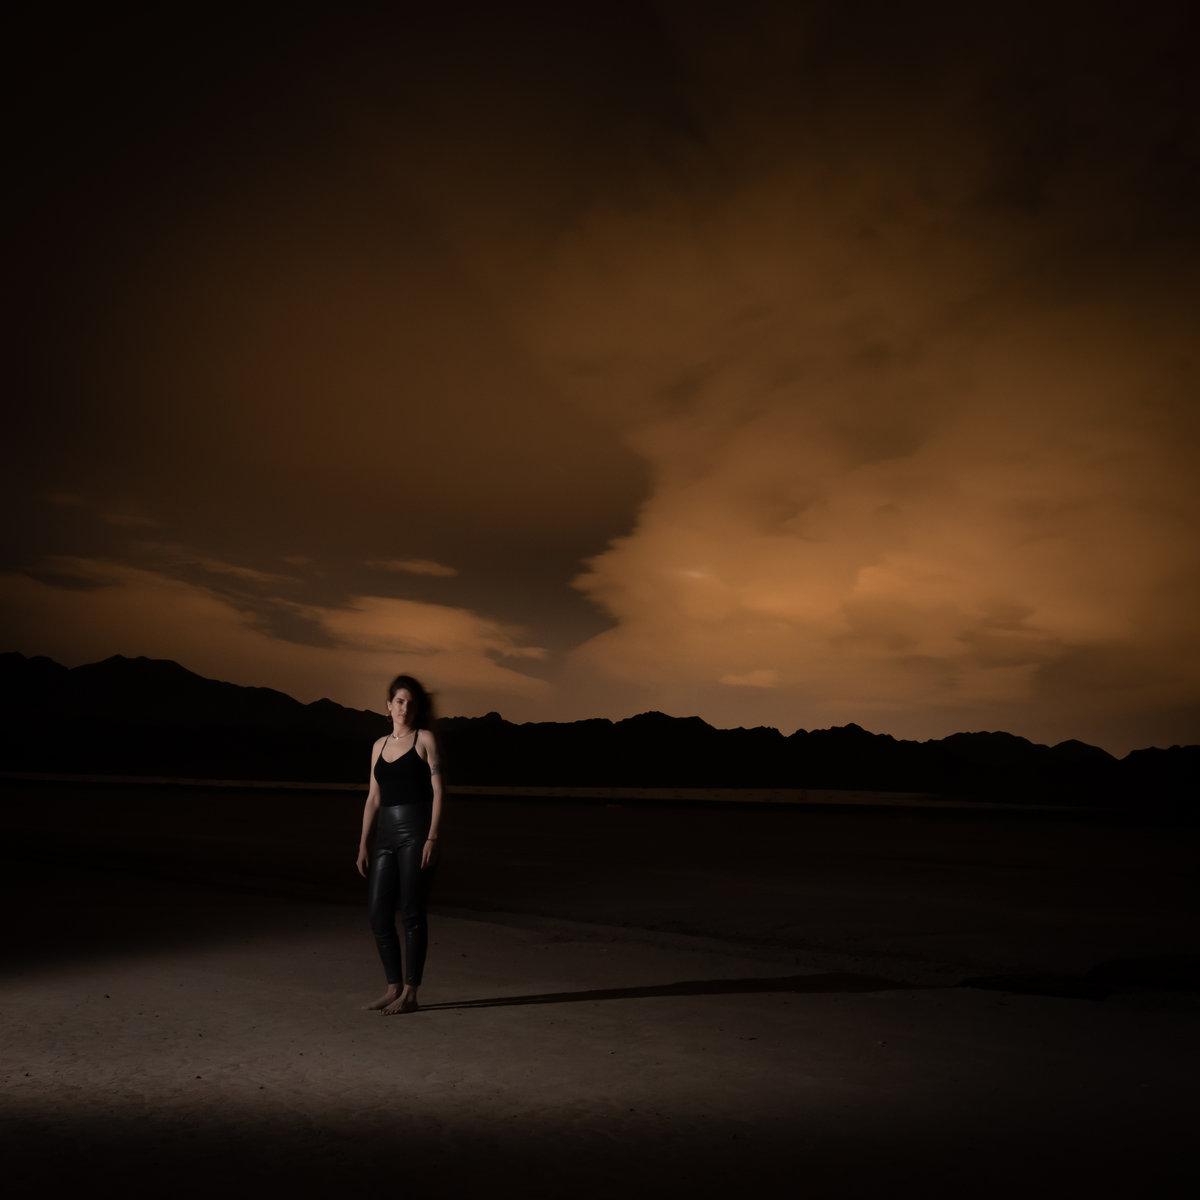 Kendra Amalie – Intuition (Beyond Beyond is Beyond)